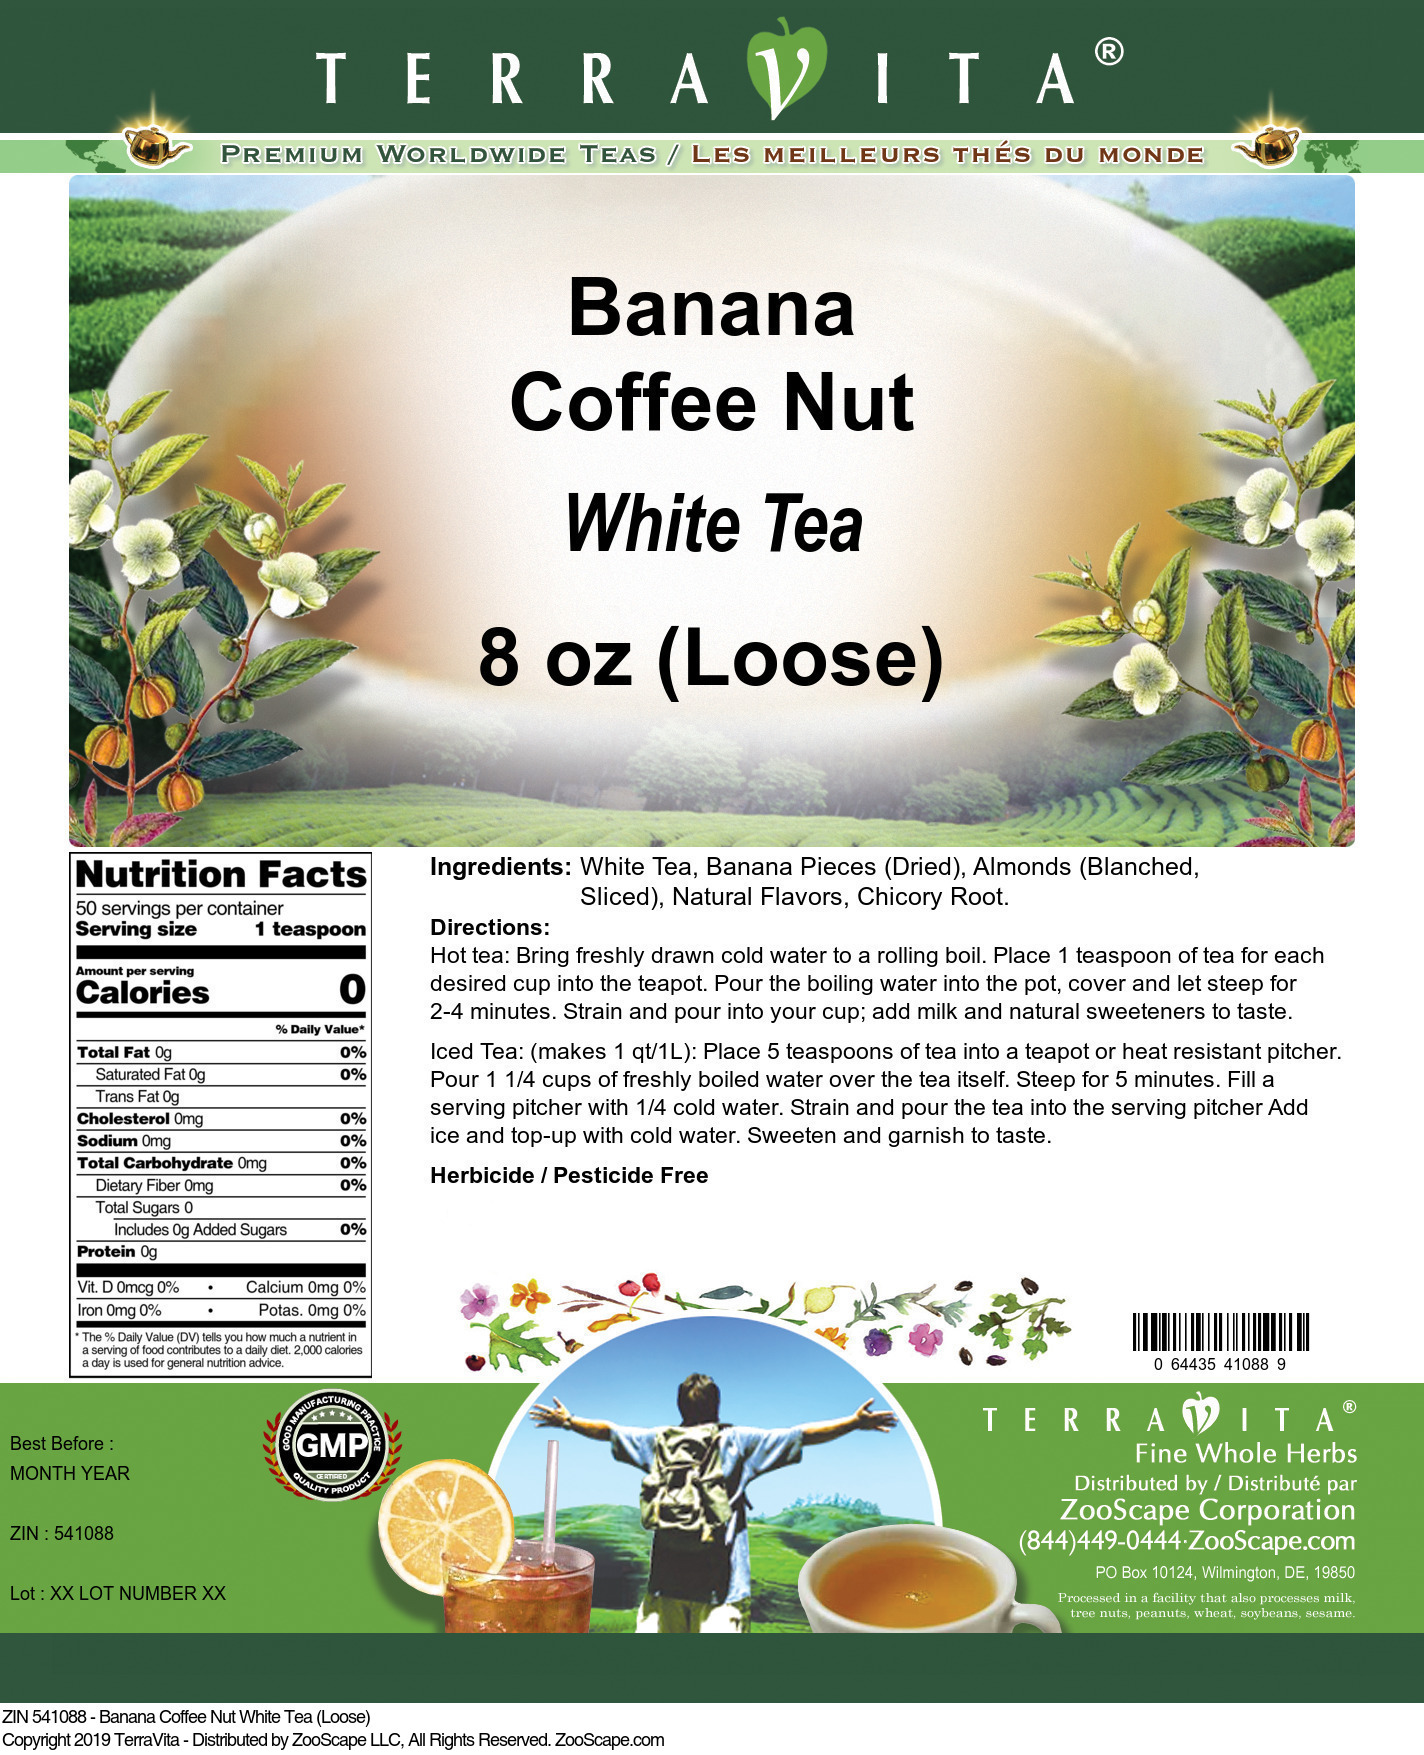 Banana Coffee Nut White Tea (Loose)